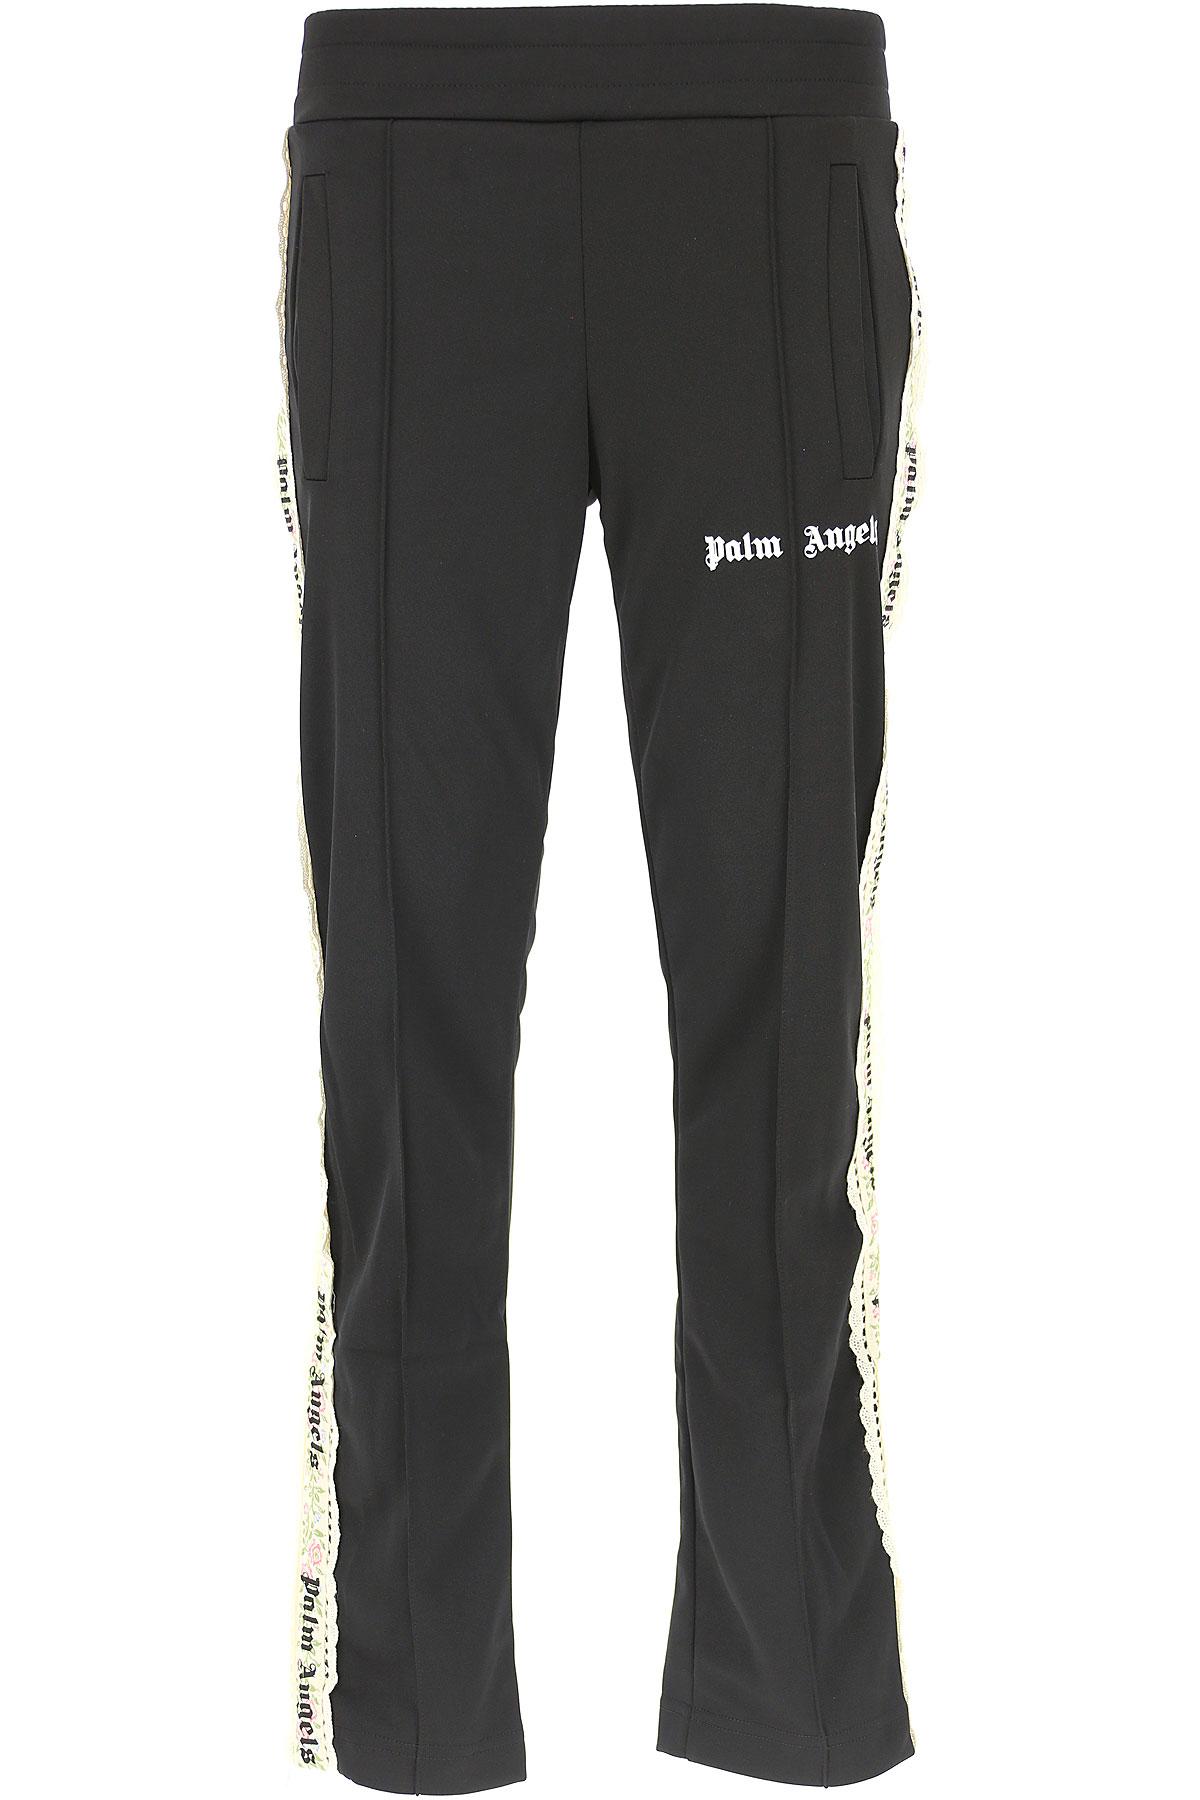 Image of Palm Angels Sweatshirt for Women, Black, polyester, 2017, S (IT 40) M (IT 42 ) L (IT 44 ) XL (IT 46) XS (IT 38)